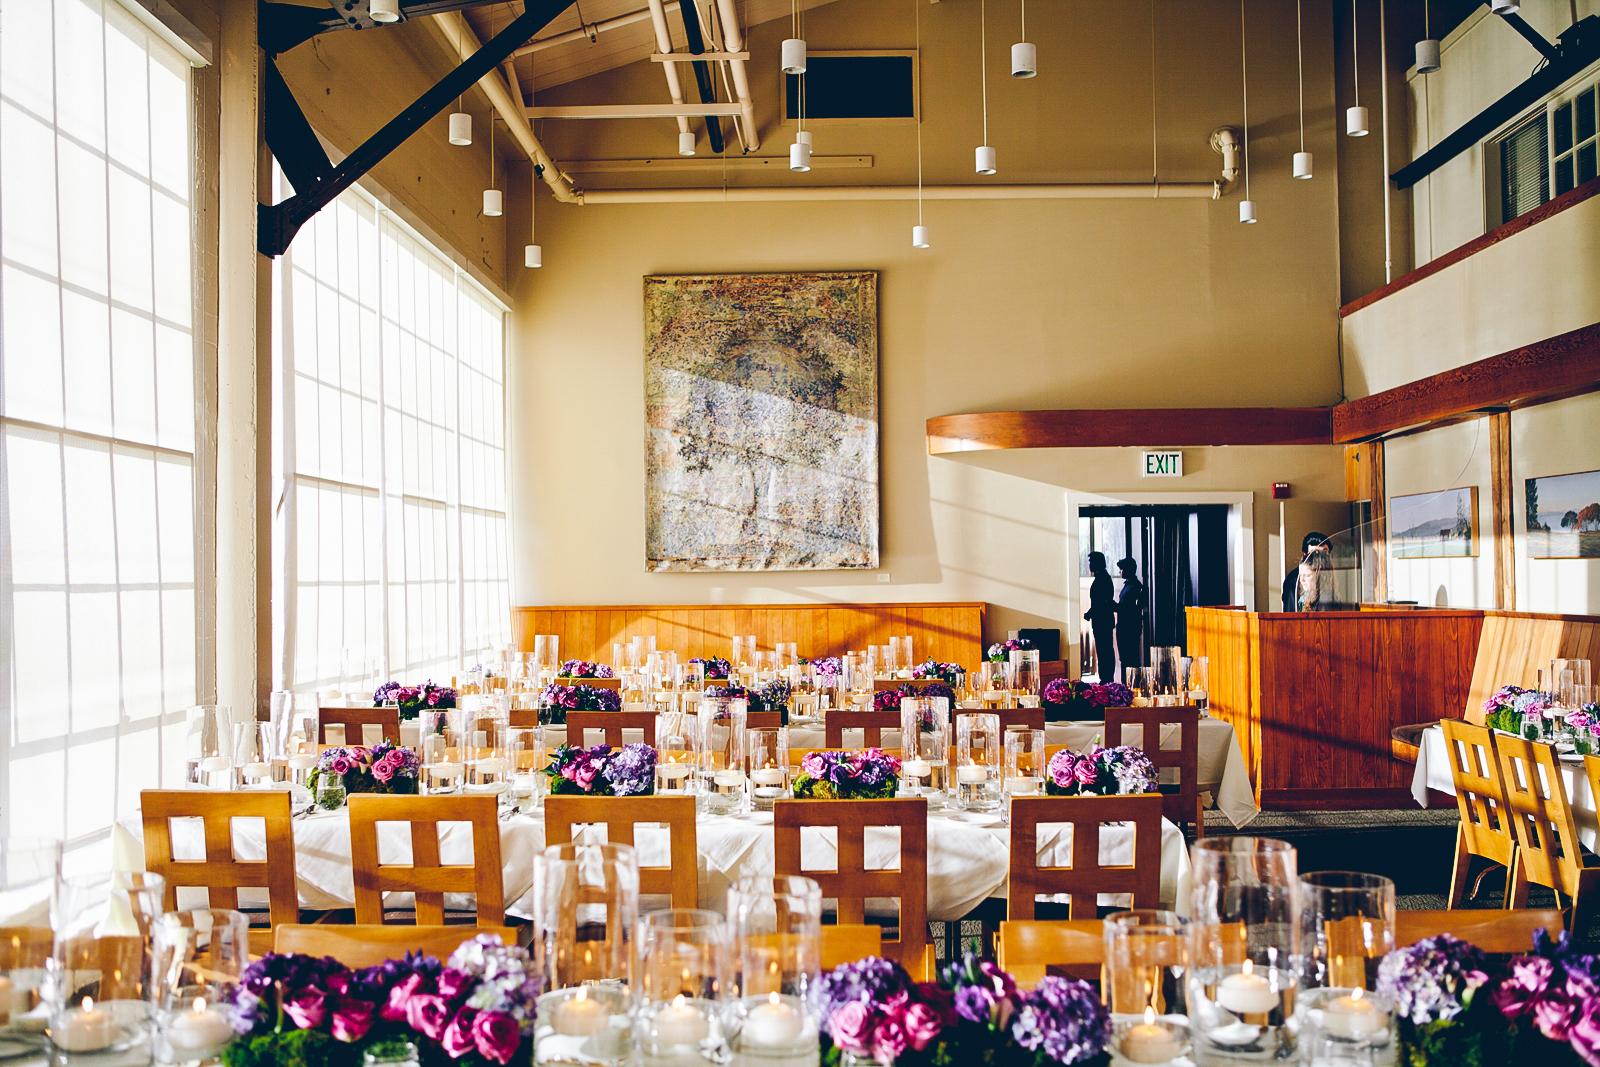 greens_restaurant_wedding_photography_san_franscisco_ebony_siovhan_bokeh_photography_34.jpg